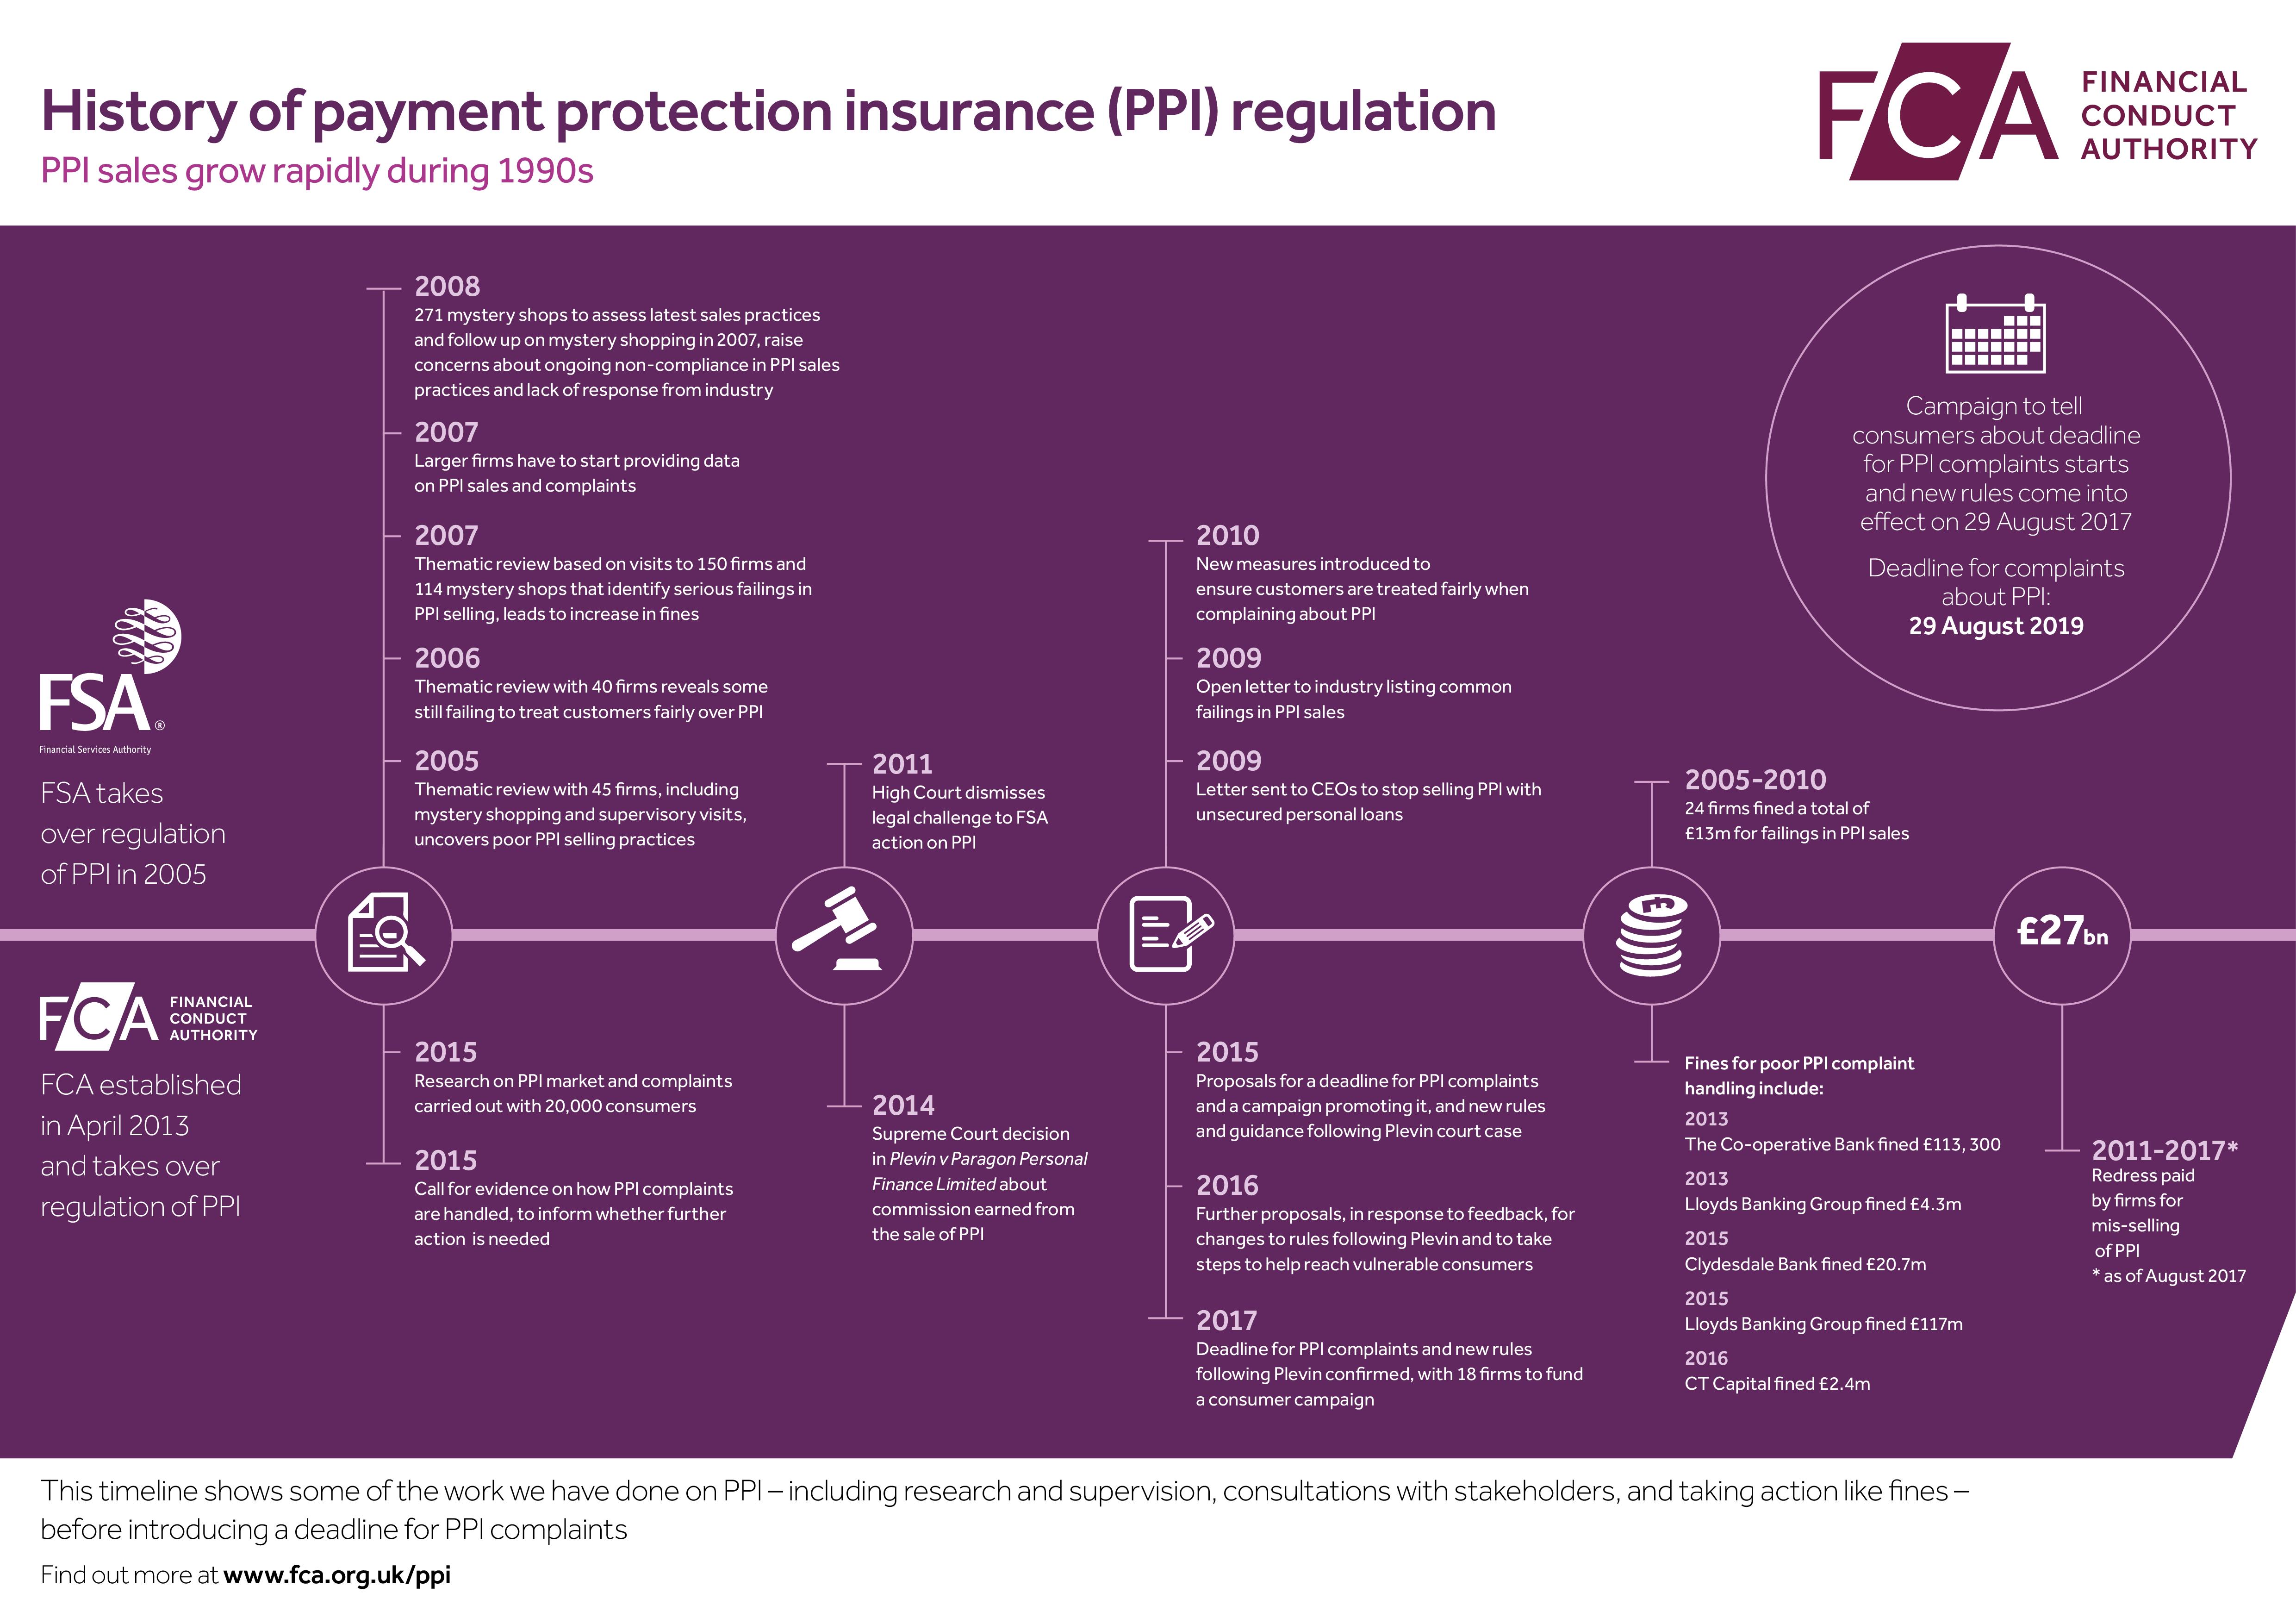 history of ppi regulation